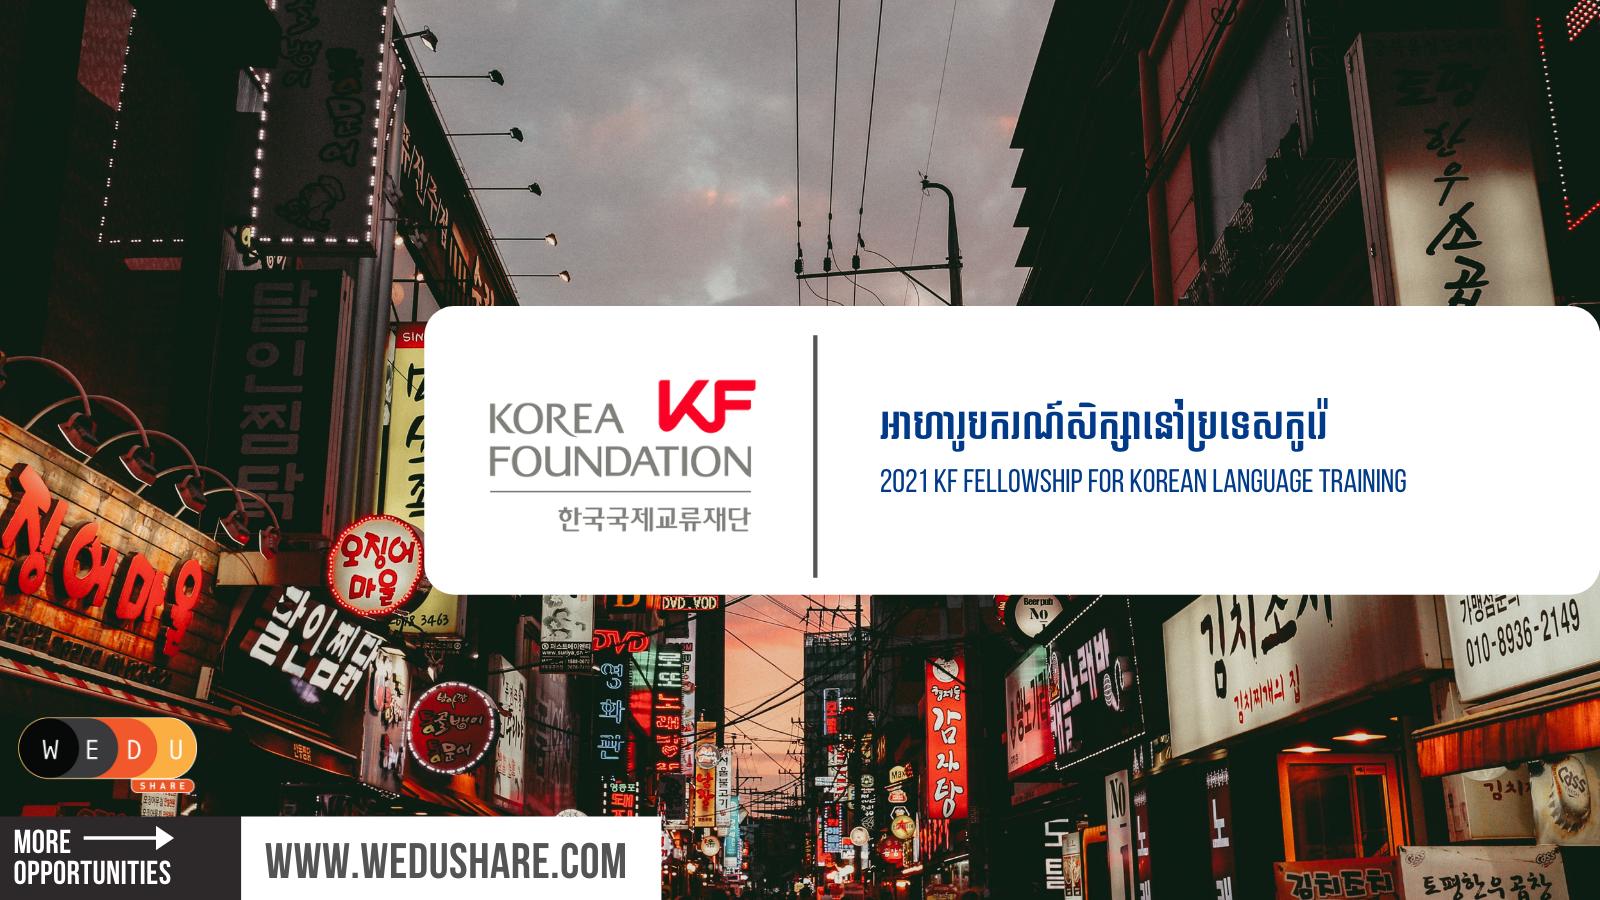 2021 KF Fellowship For Korean Language Training